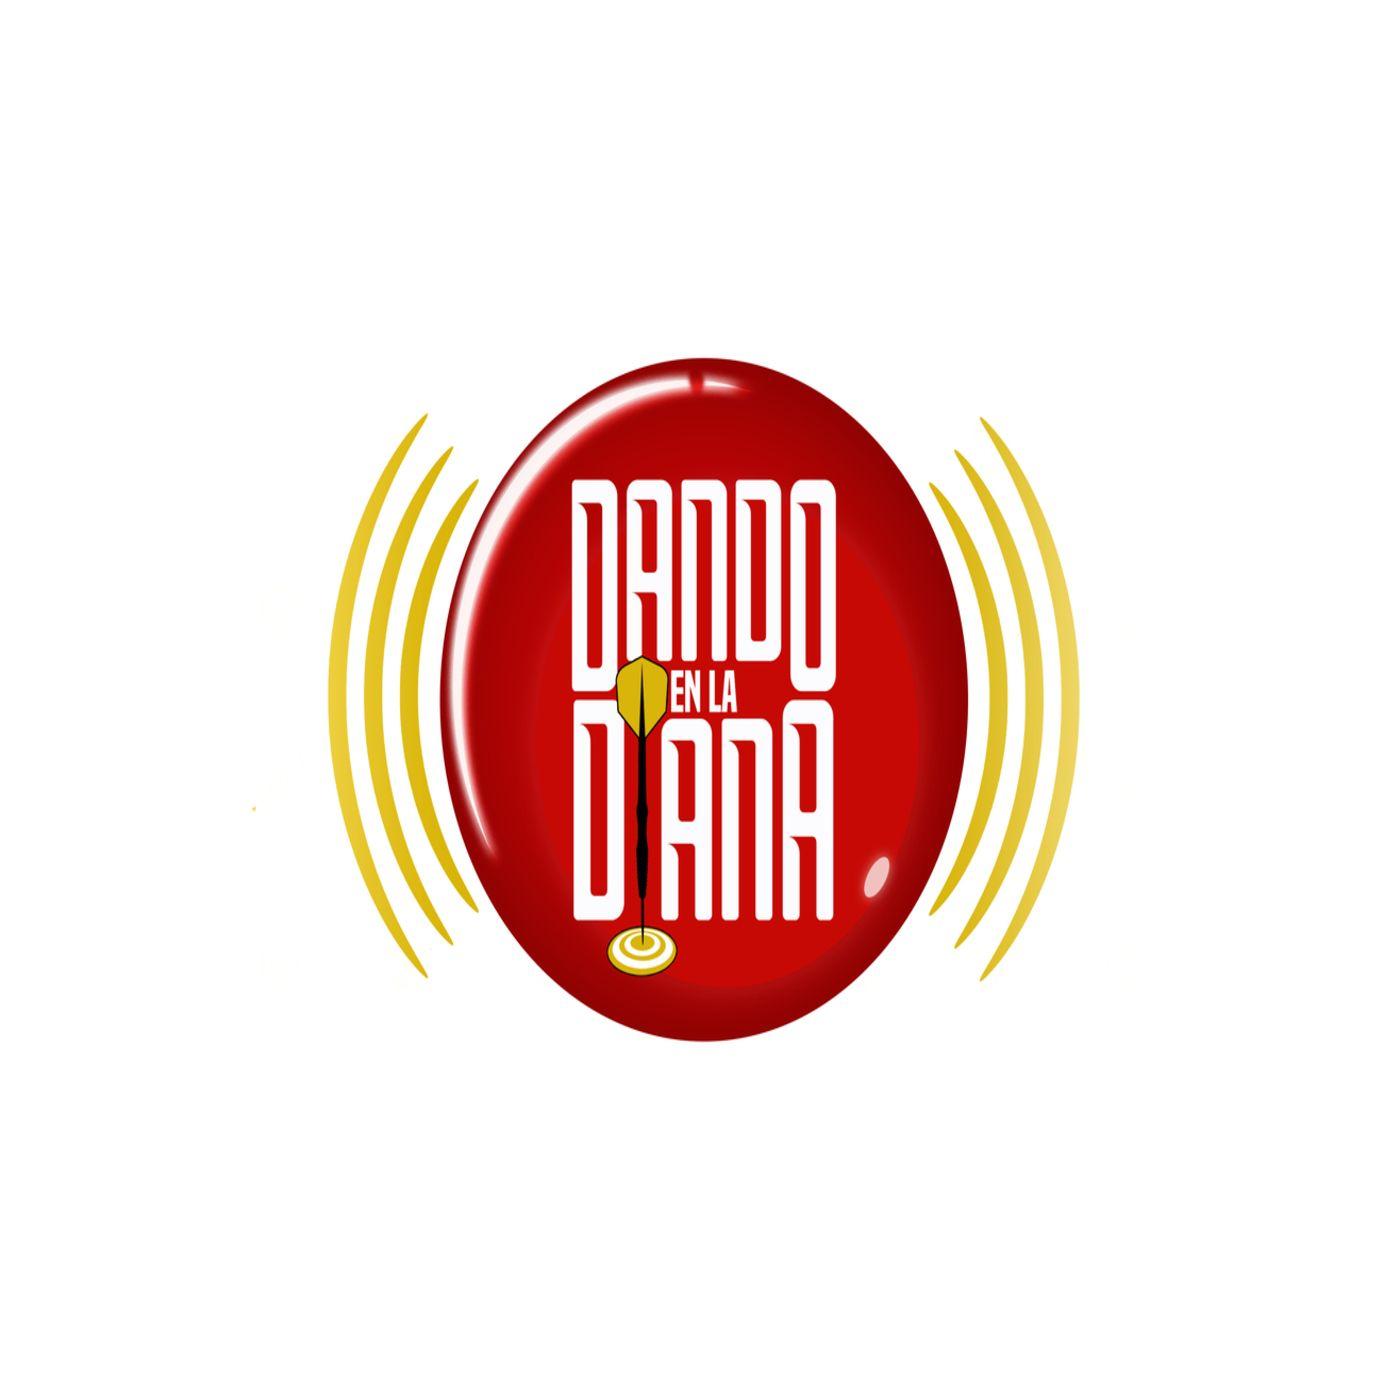 Dando en la Diana - Episodio 78 - 16 Diciembre 2020 - Kimberly Castillo / Josenis Lluberes